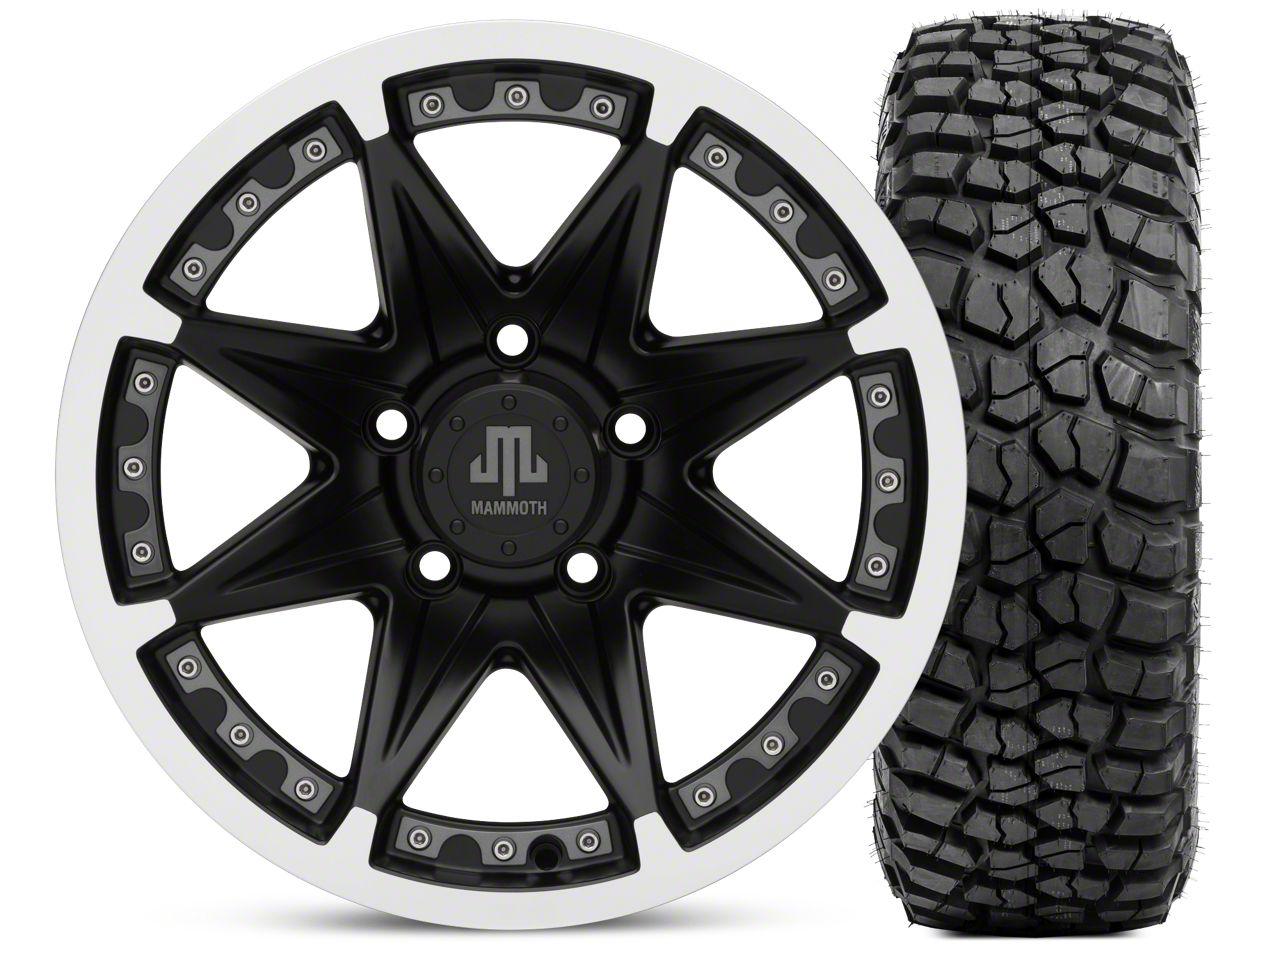 Mammoth Type 88 Wheel - Matte Black Wheel - 16x8 Wheel - & BFG KM2 Tire 315/75- 16 (07-18 Jeep Wrangler JK)